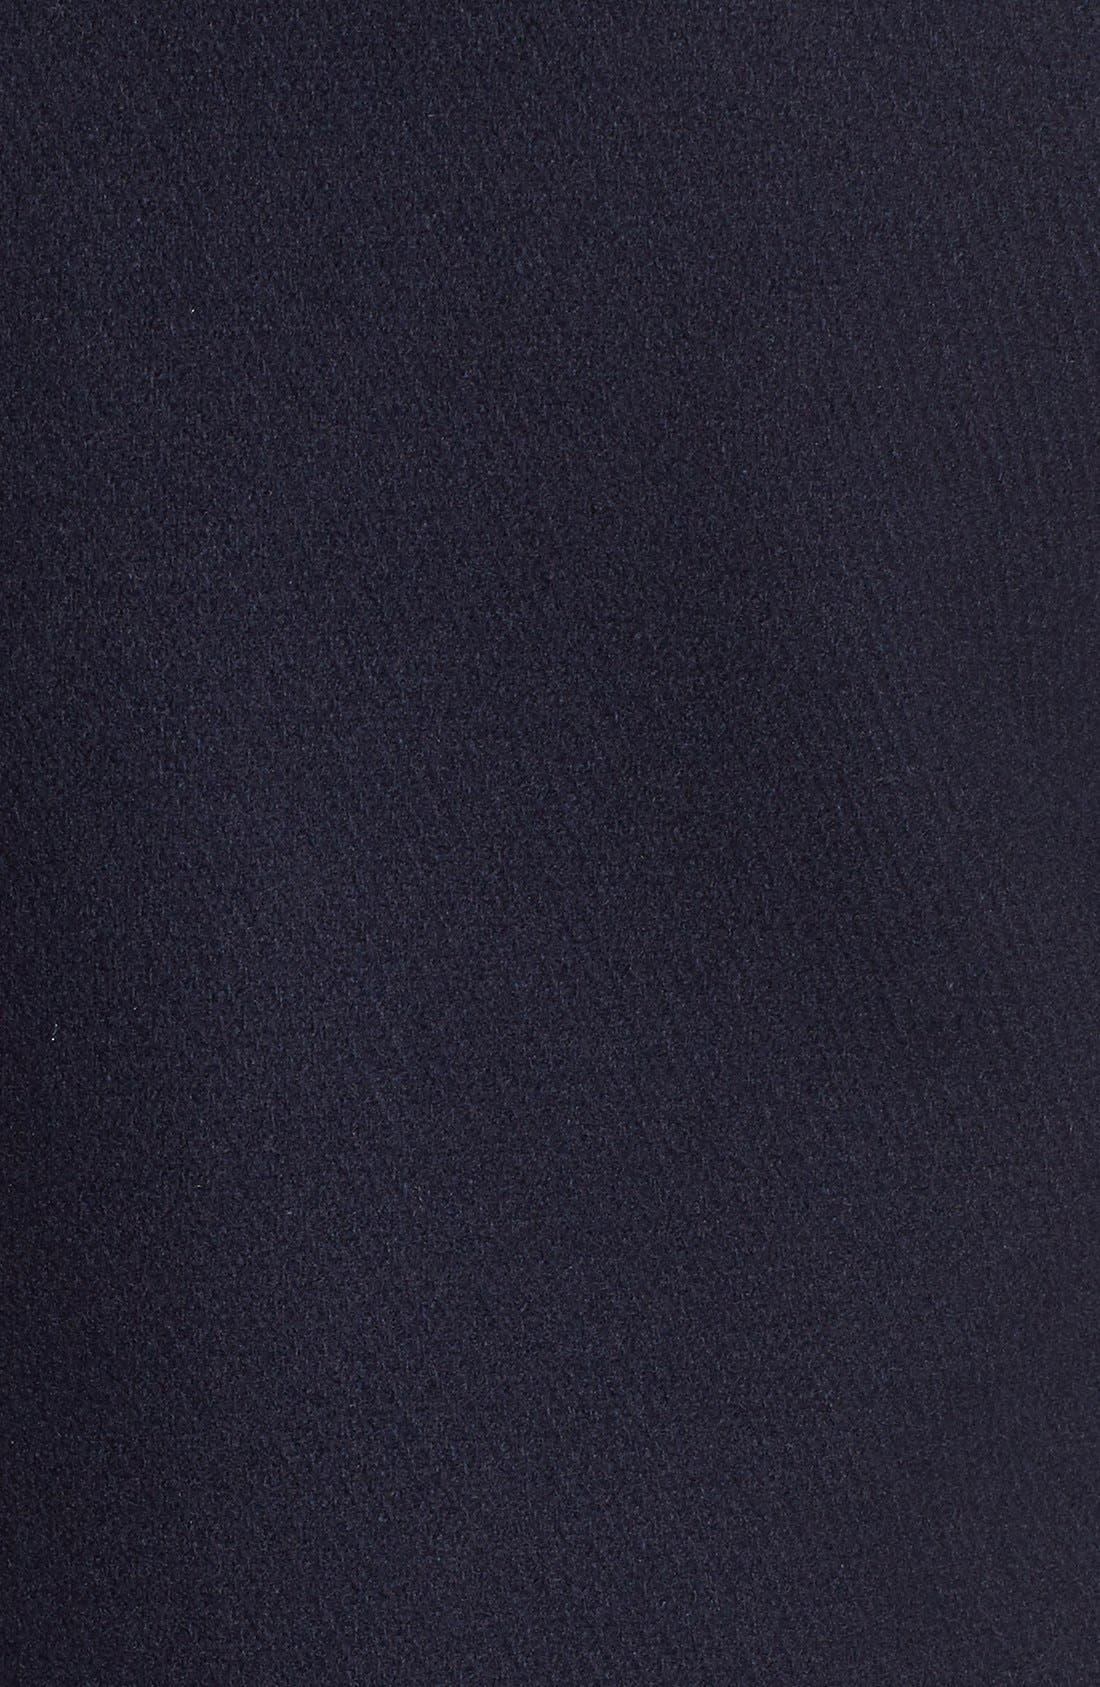 Wool Blend Peacoat,                             Alternate thumbnail 5, color,                             Utility Blue